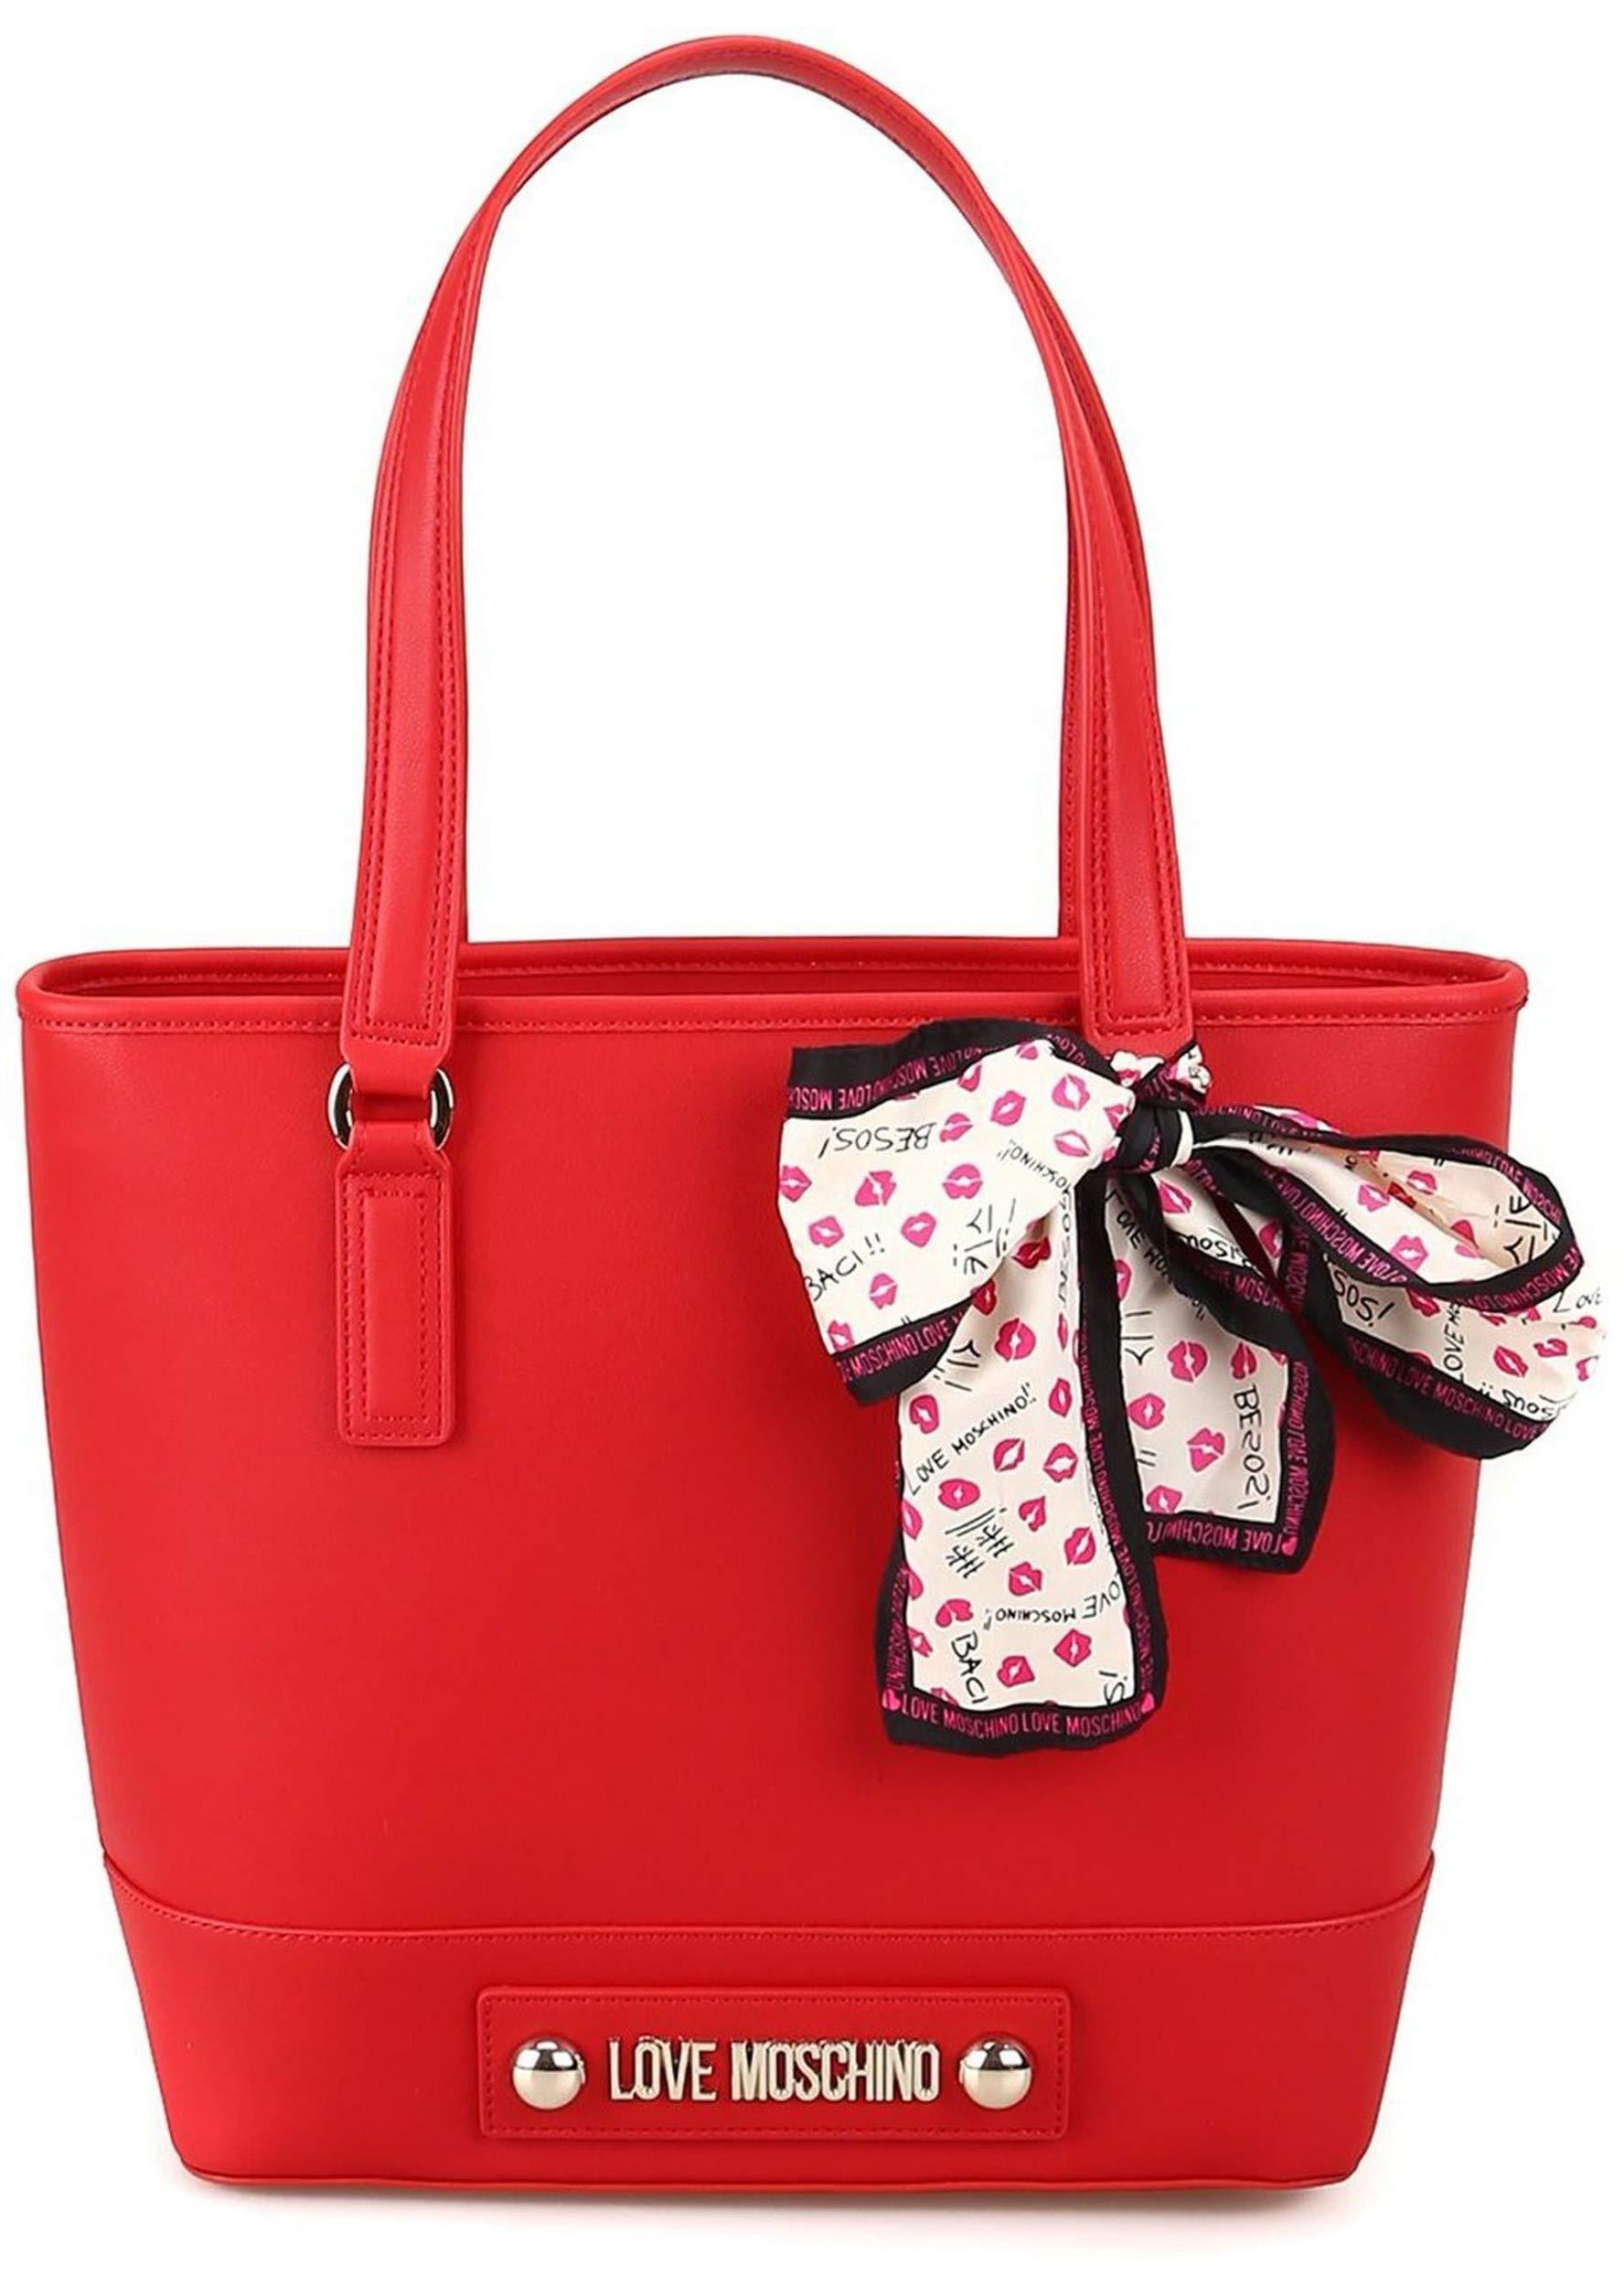 LOVE MOSCHINO women/'s SHOULDER BAG JC4243PP08KG